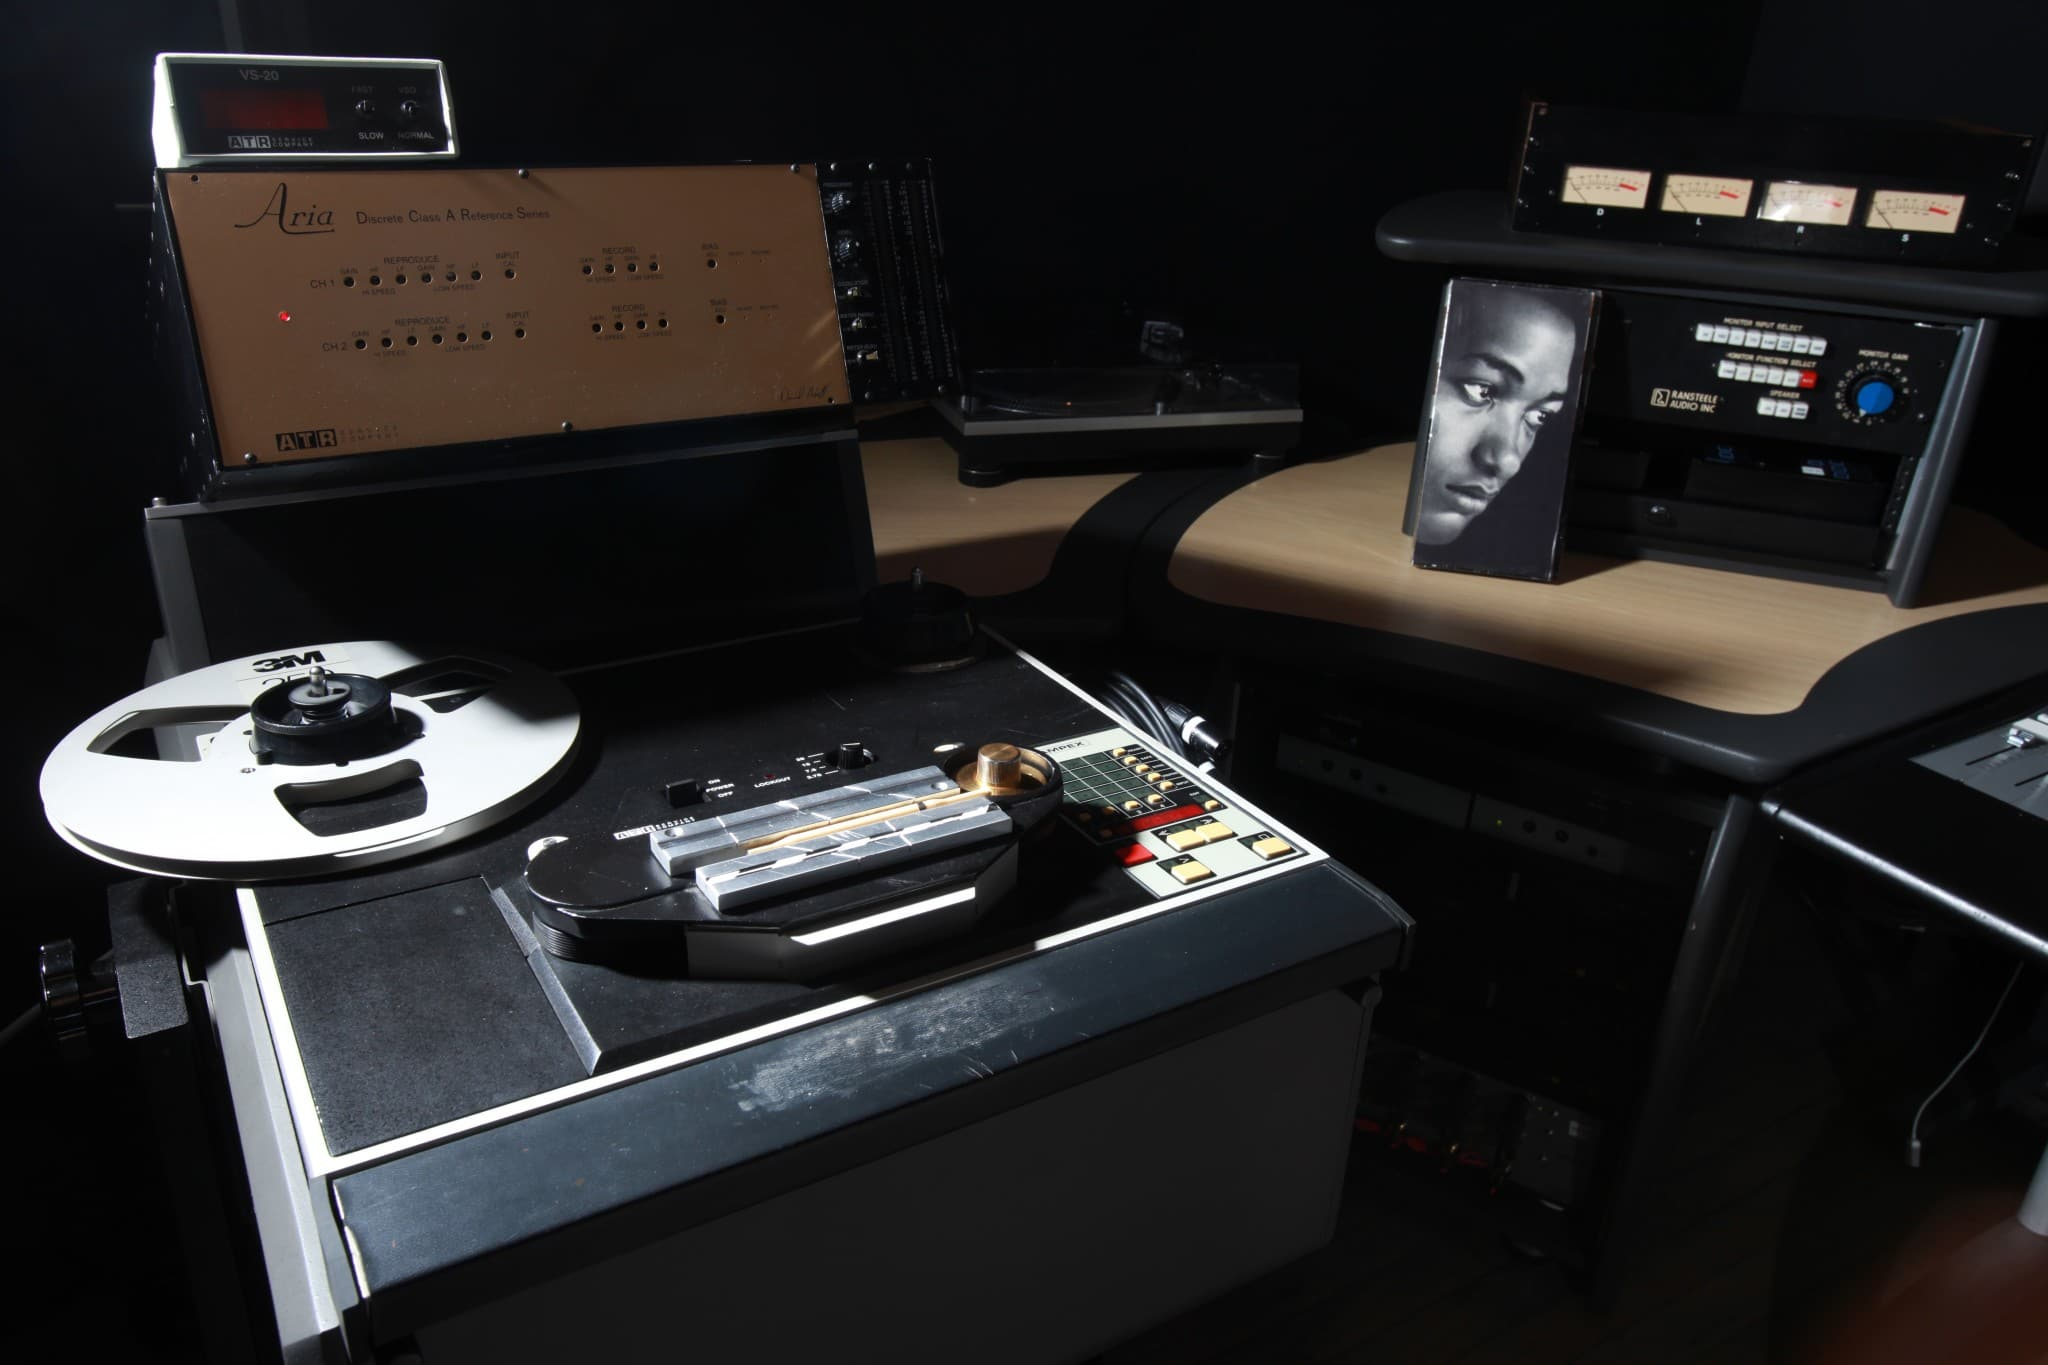 abkco-studio-ampex-atr-102